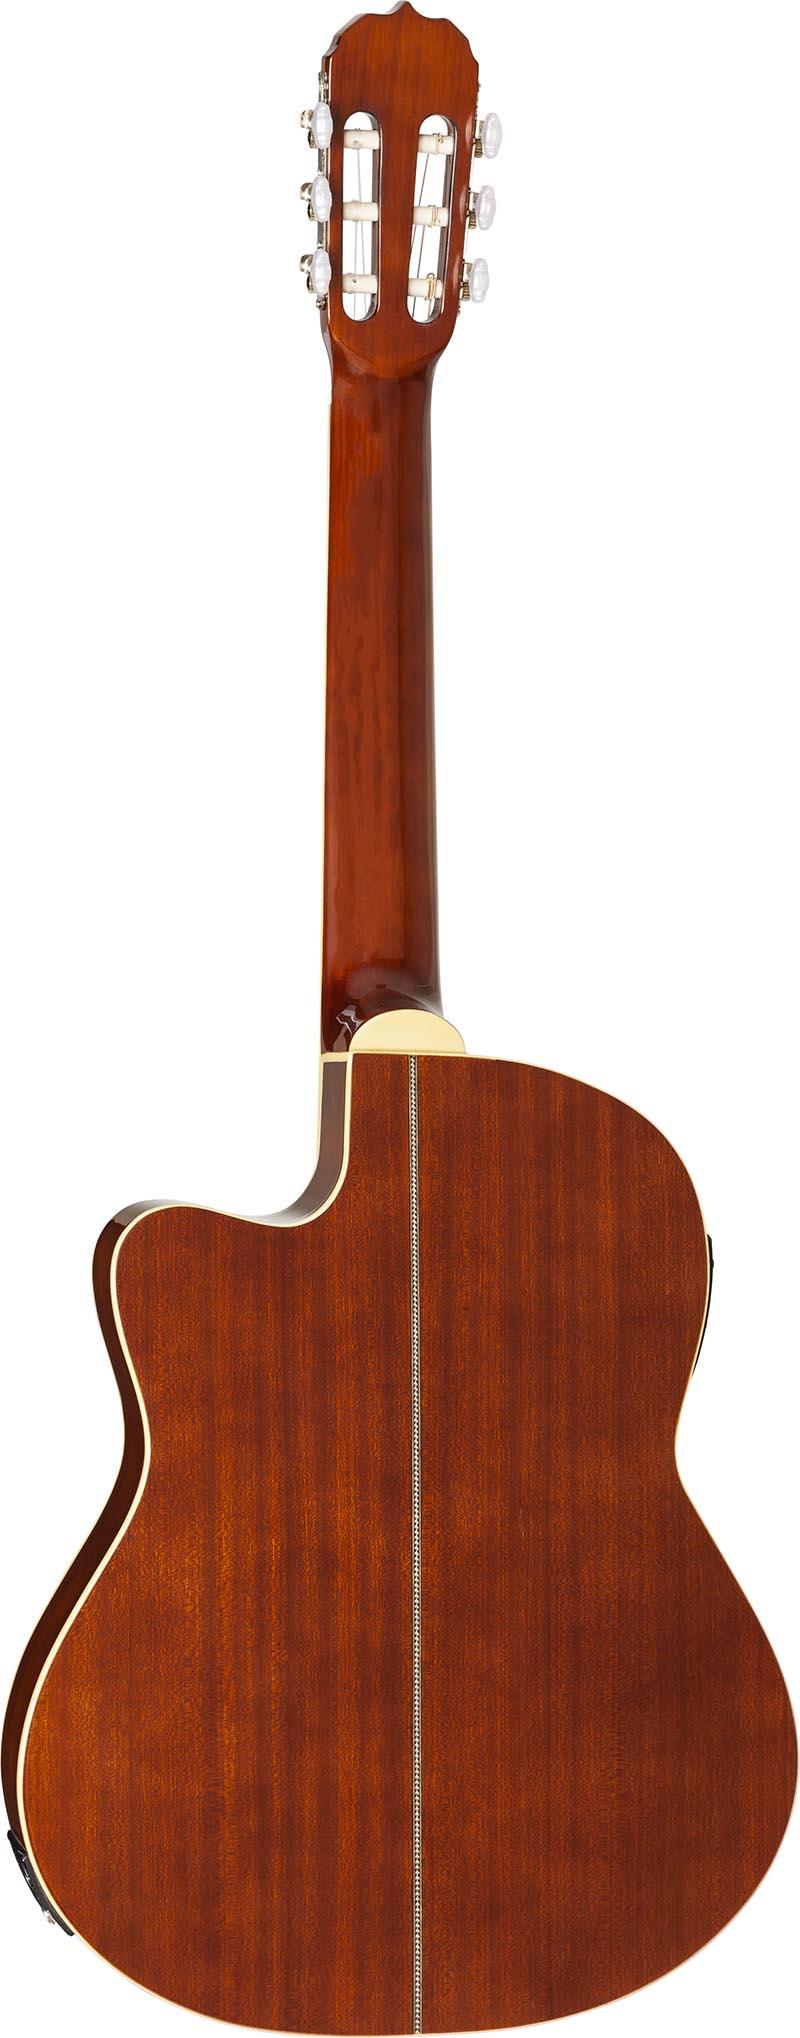 hmc225 violao classico flat hofma hmc225 nt natural visao posterior vertical